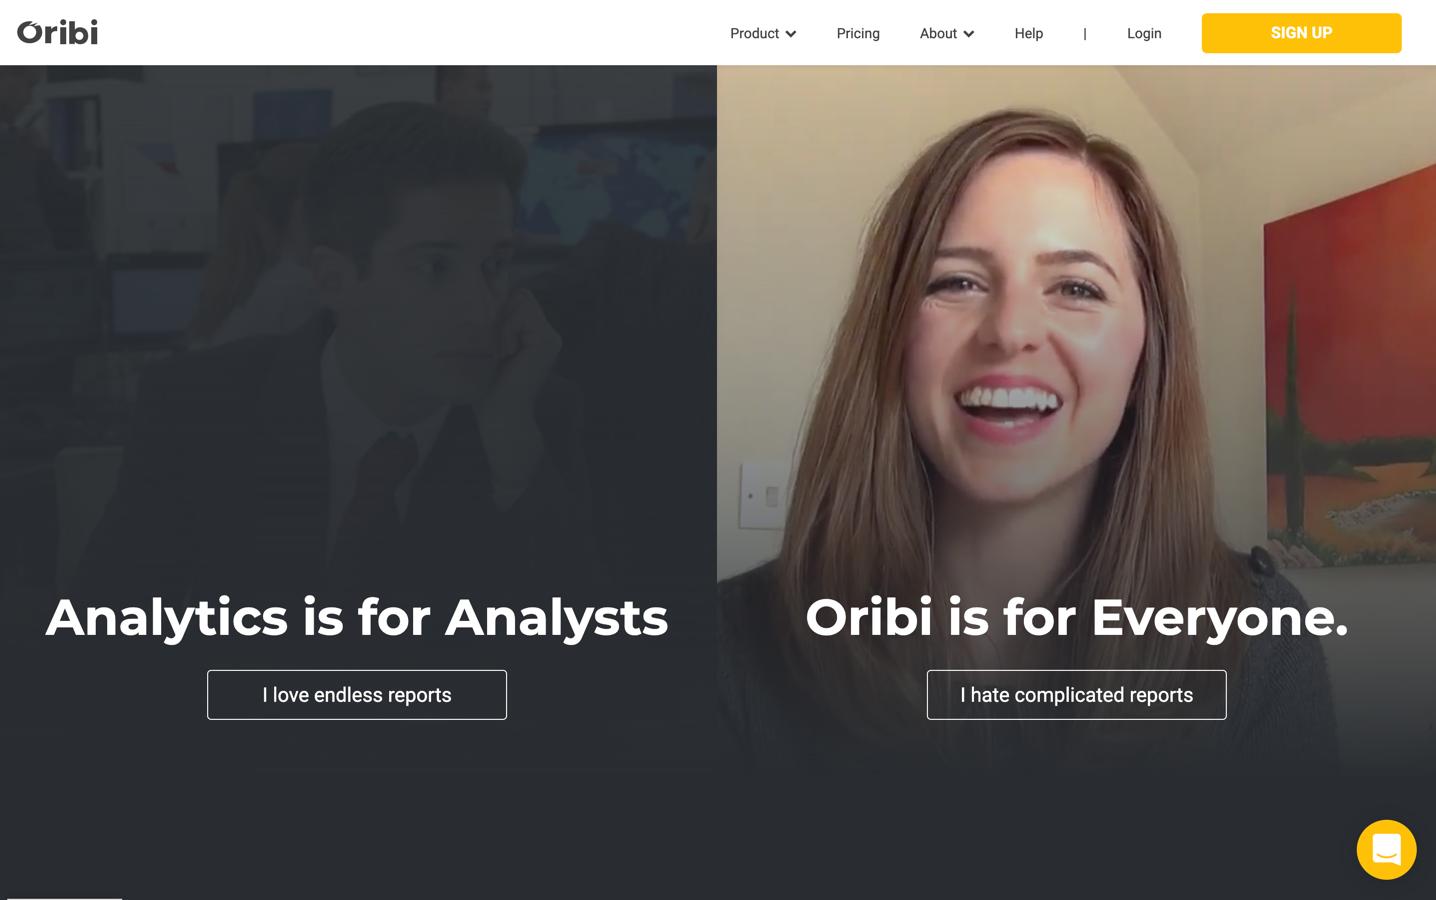 oribi homepage